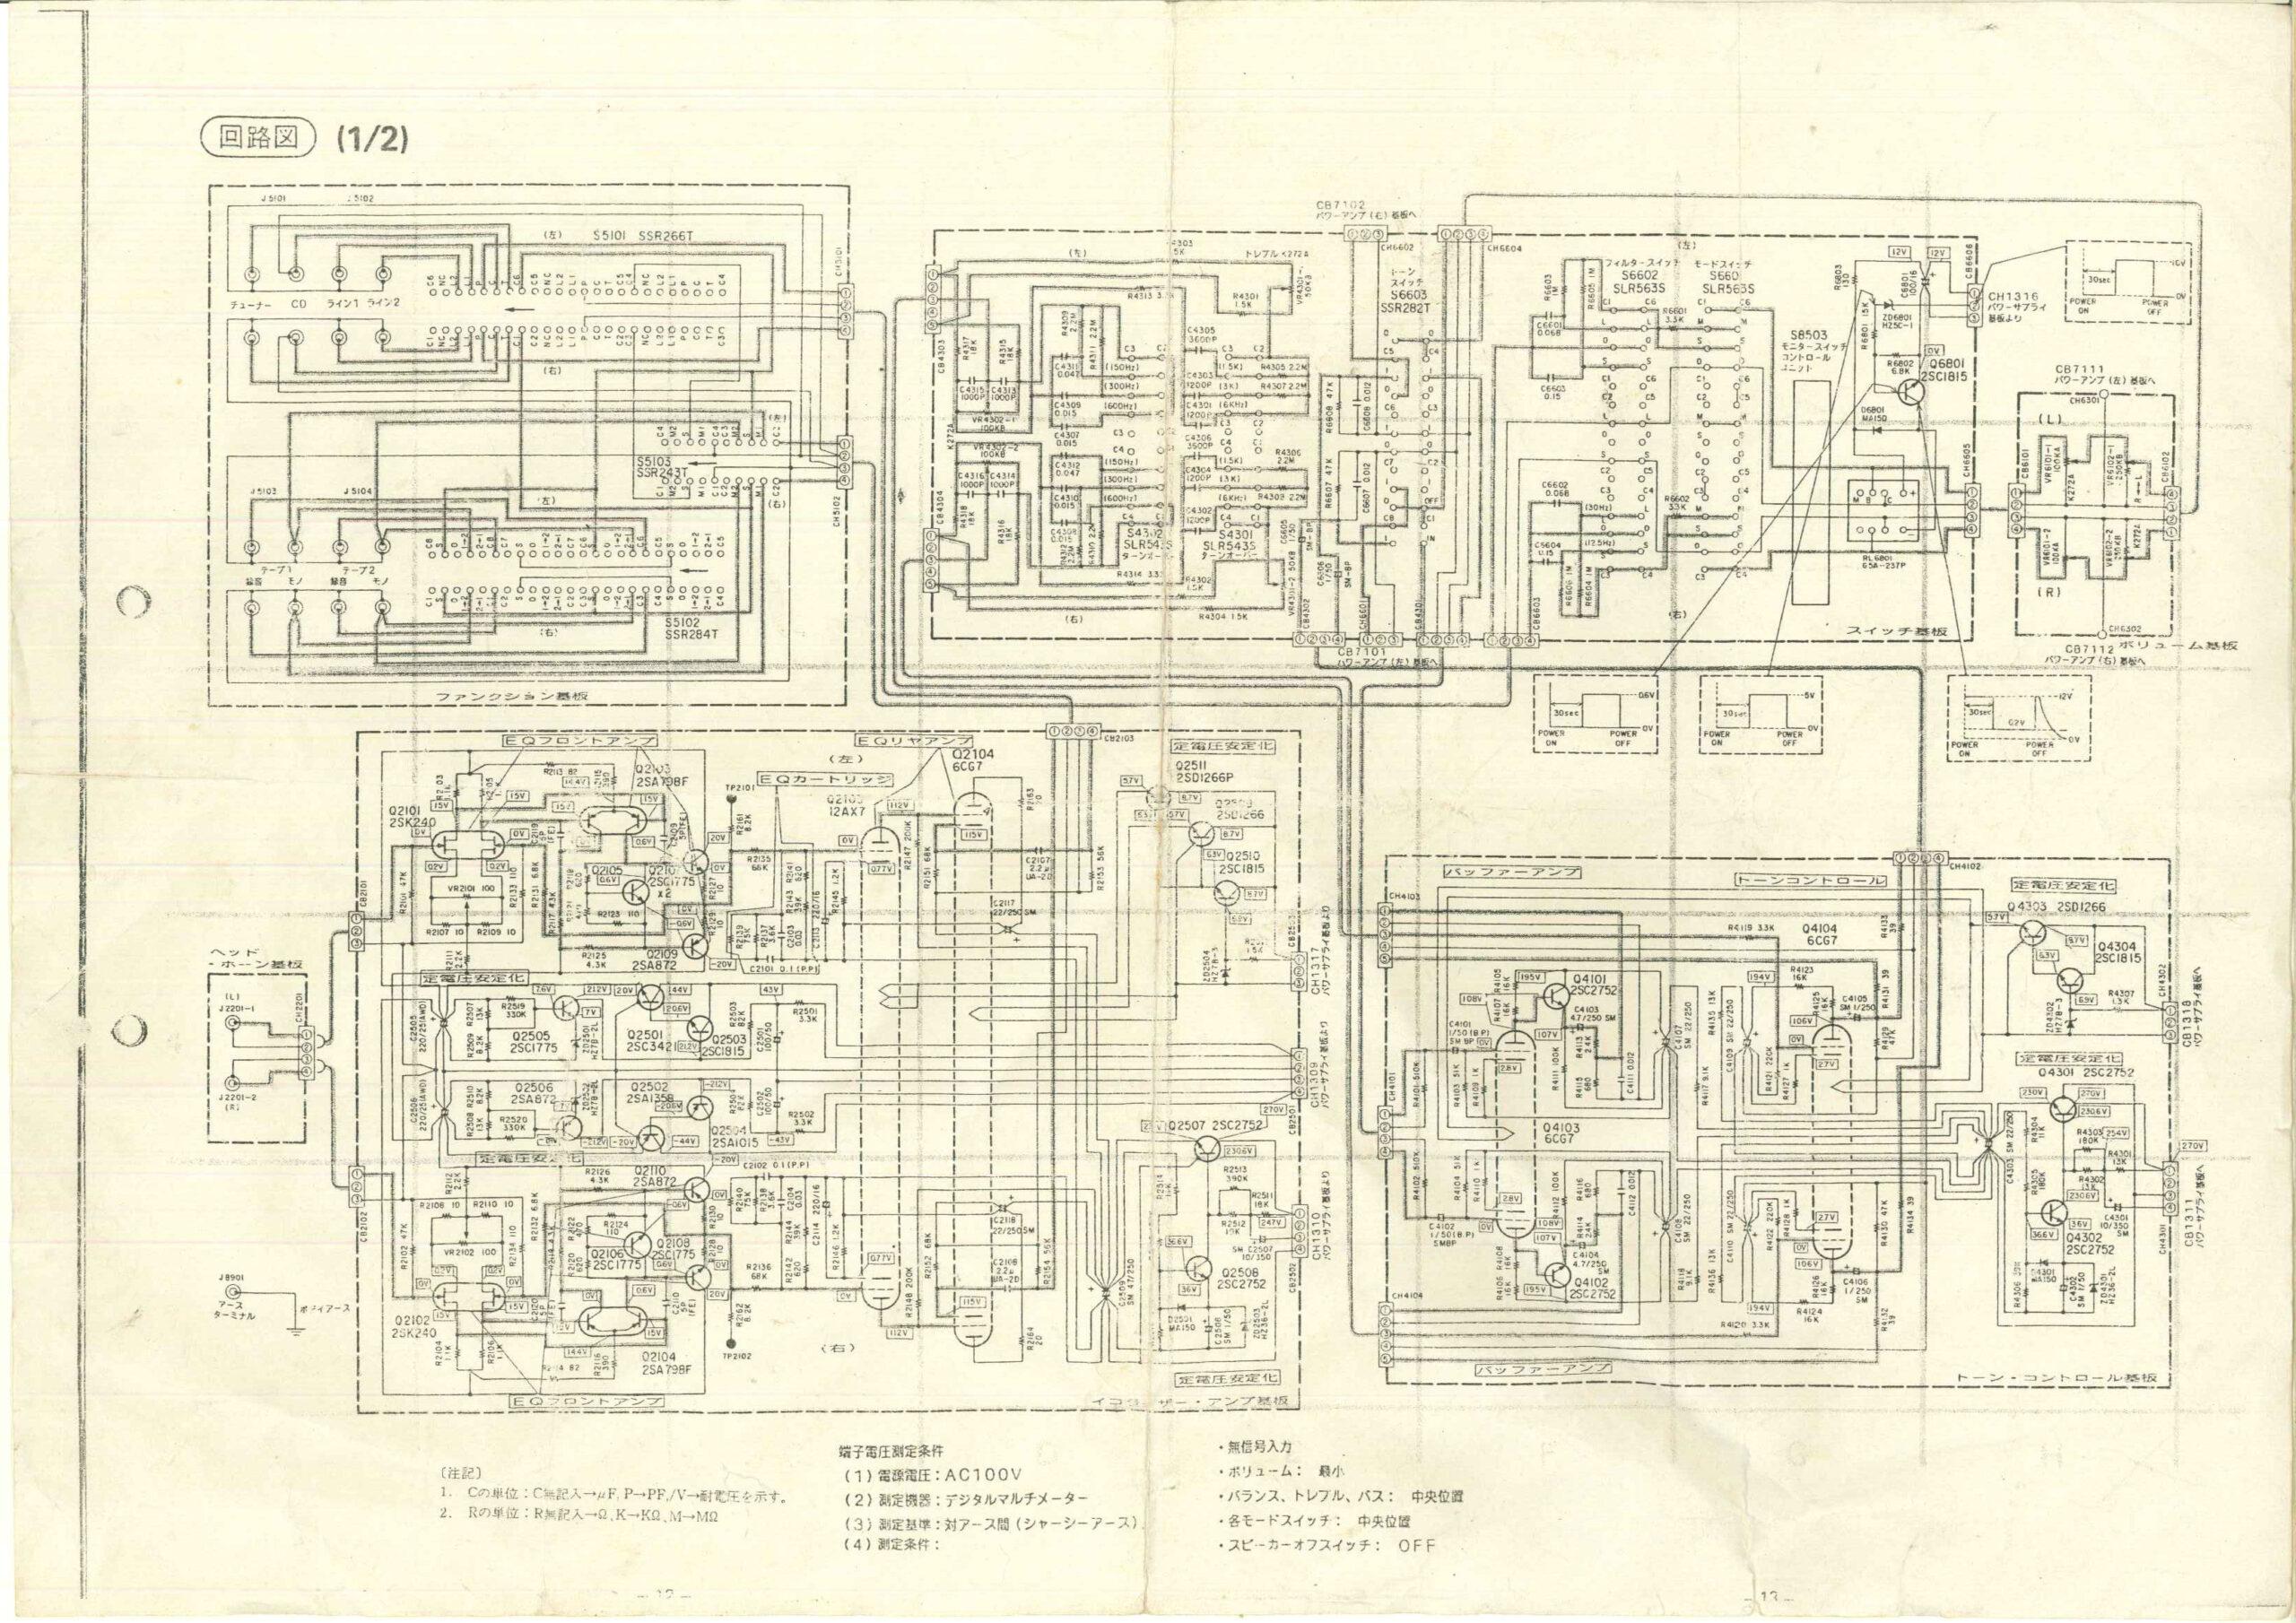 LX-360プリアンプ回路図